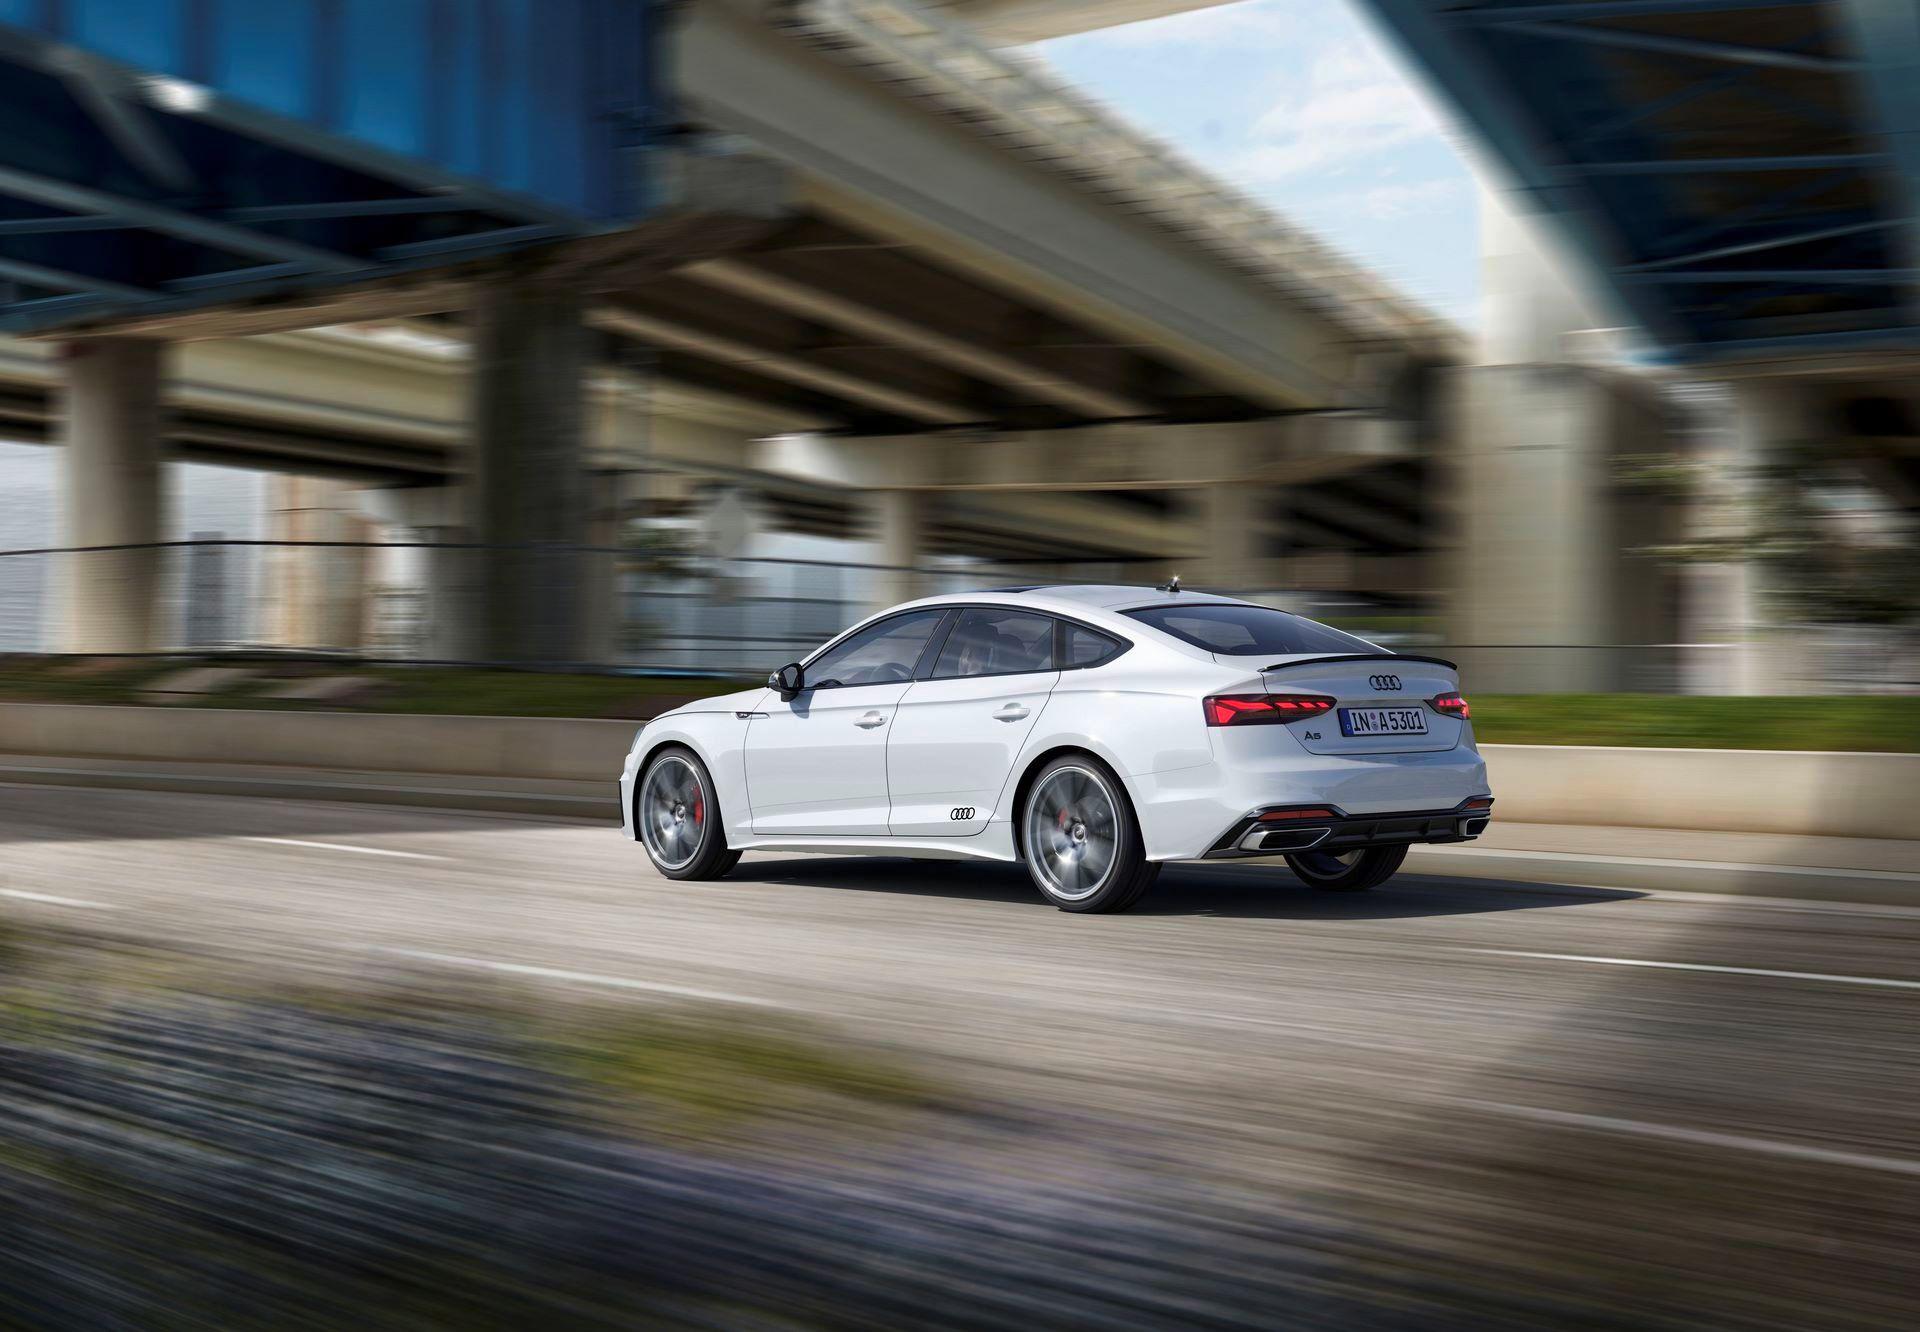 Audi-A4-A5-Q7-Q8-Competition-And-Competition-Plus-Trims-71